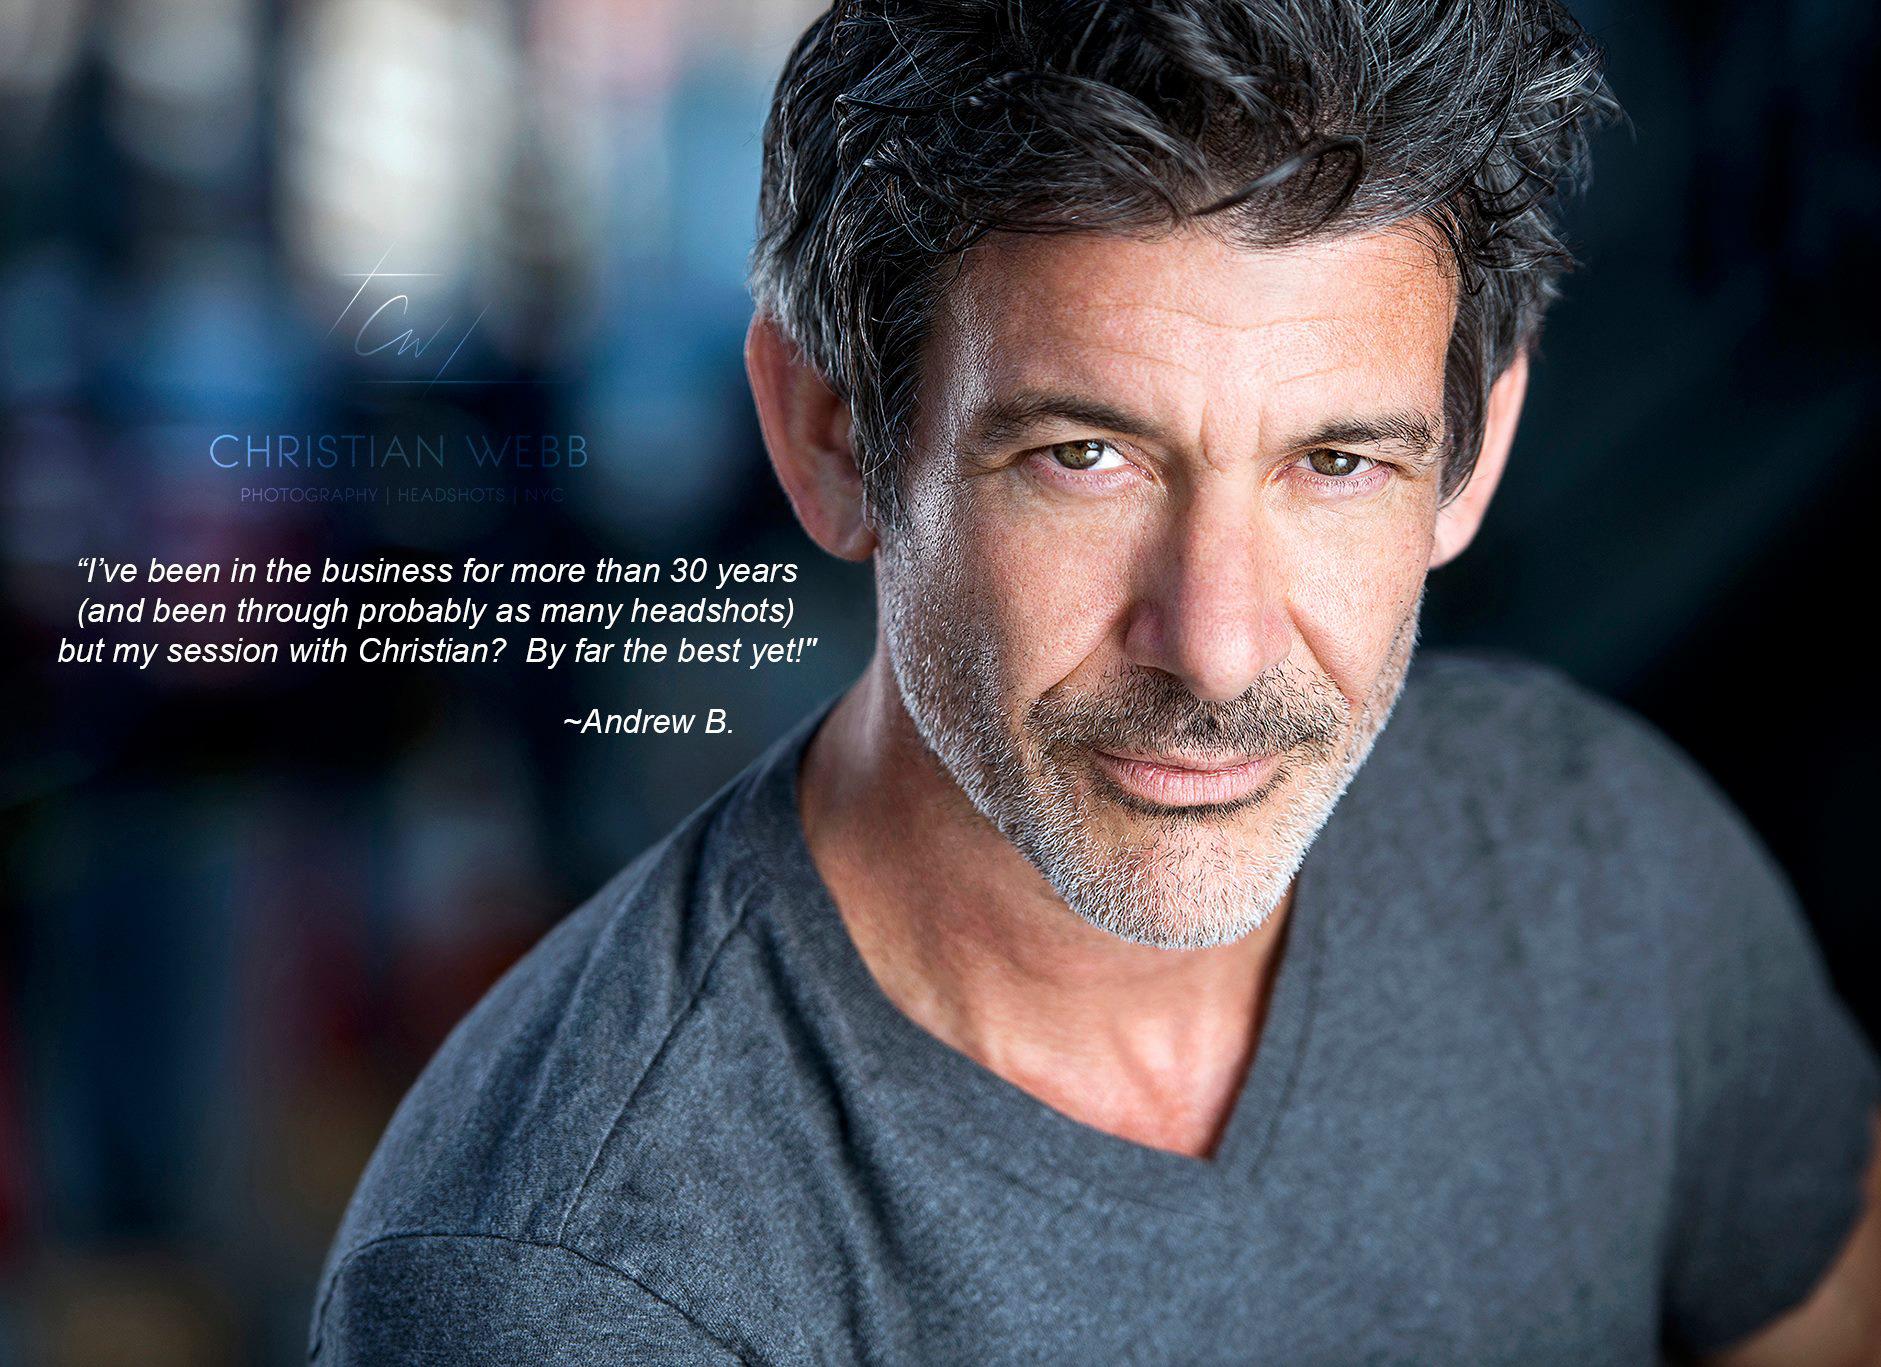 Christian Webb-Headshots-Atlanta-New York-AB-Testimonial.jpg